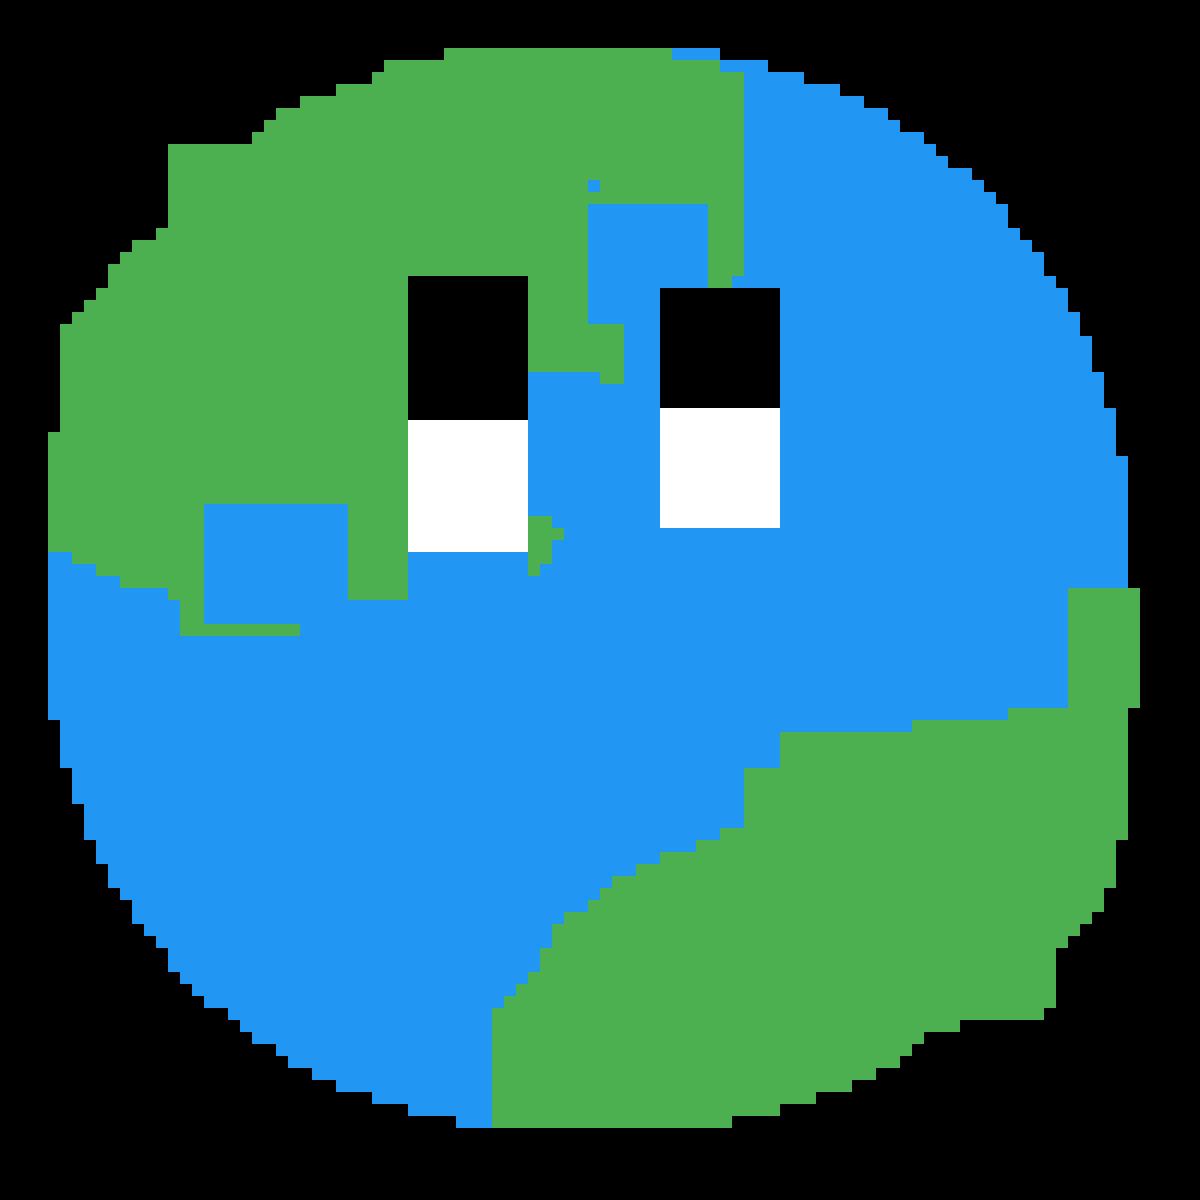 Earth by xAVETTx